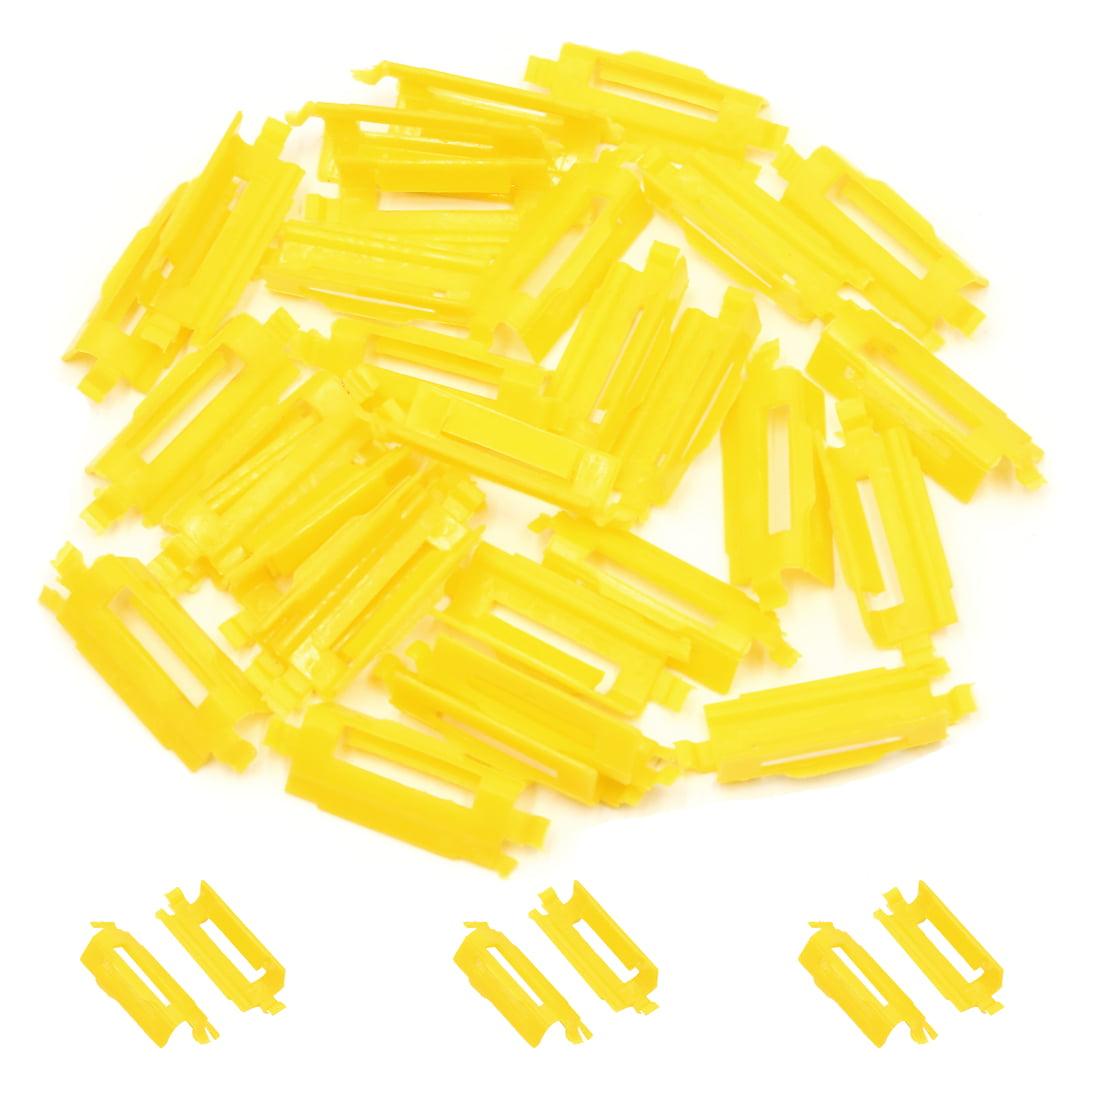 30 Pcs Yellow Car Auto Retainer Carpet Floor Mat Rivet Clips Fasteners - image 1 of 2